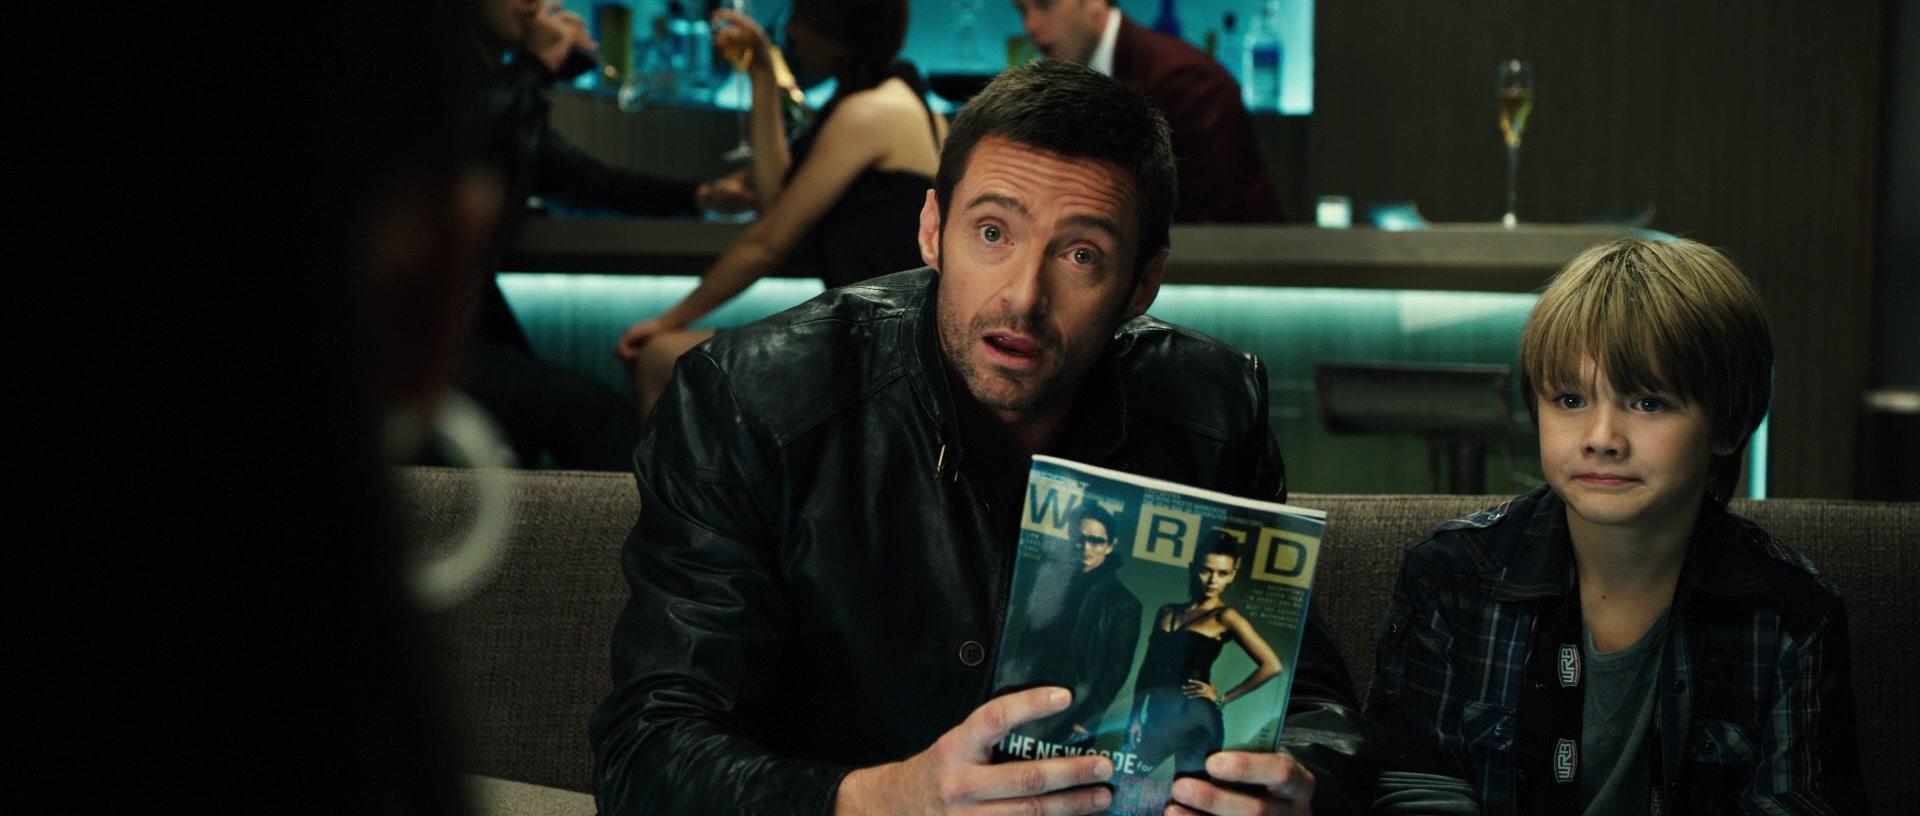 Wired Magazine Held By Hugh Jackman As Charlie Kenton In Real Steel 2011